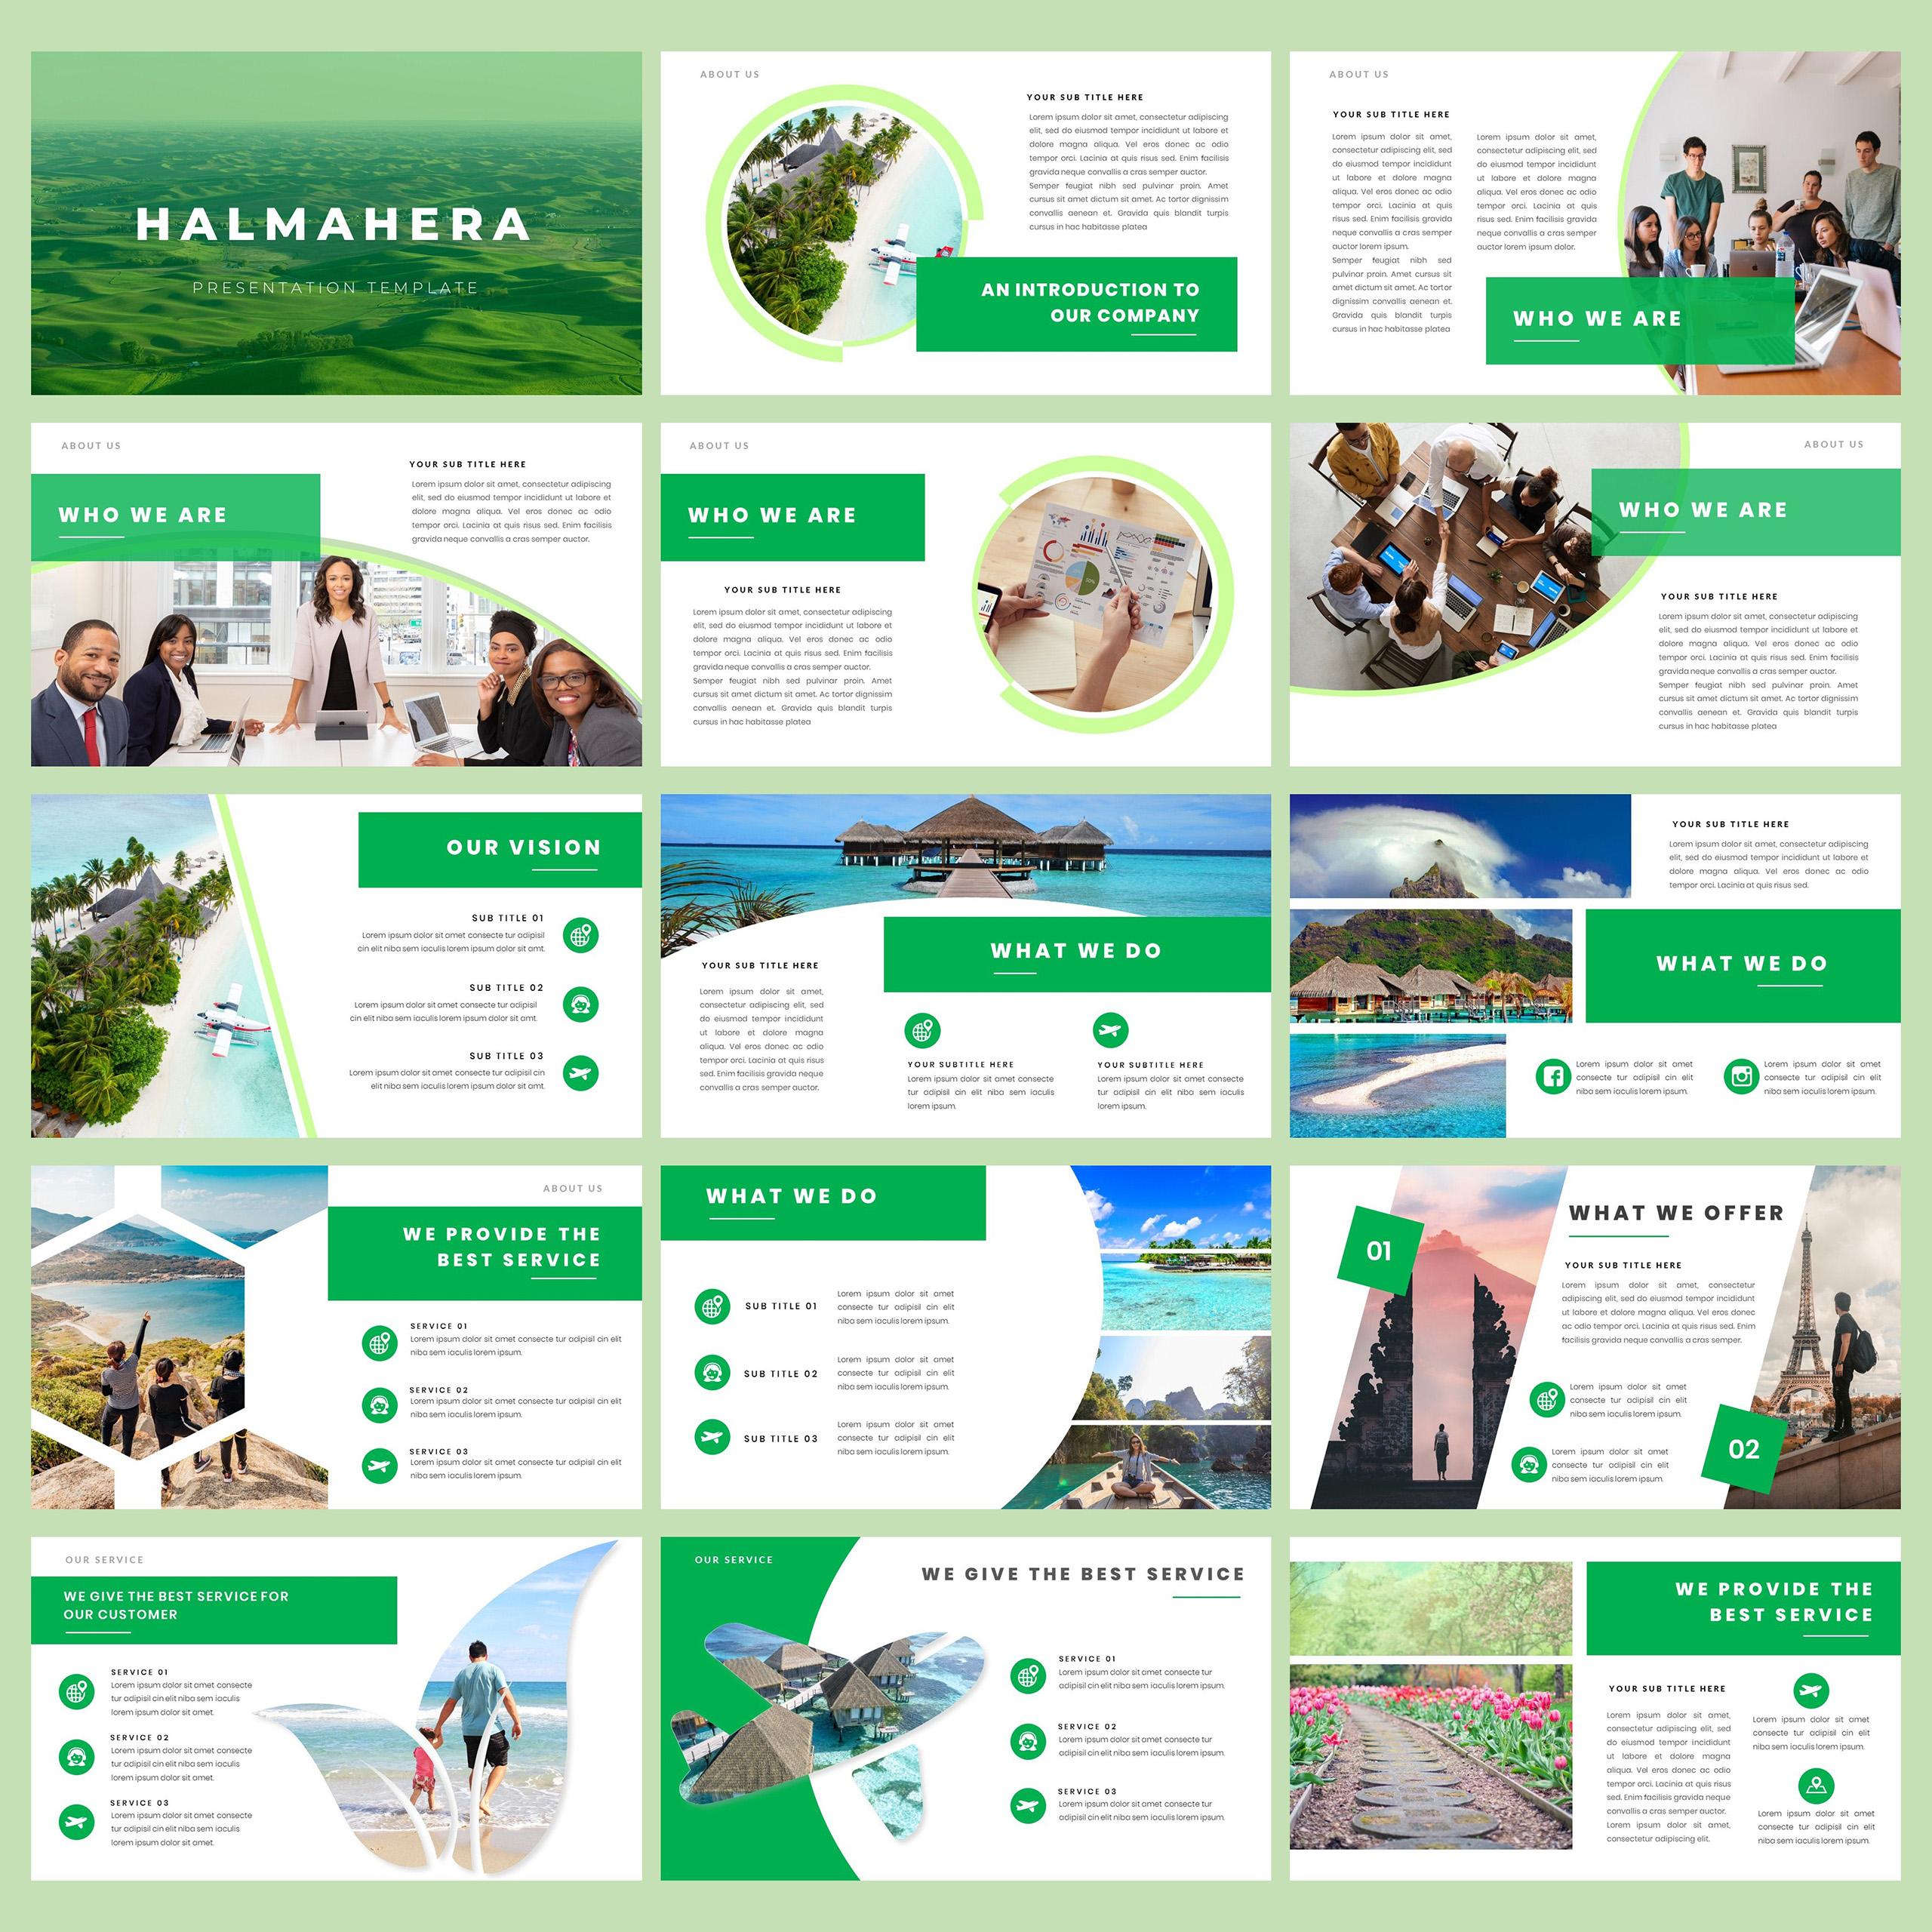 Halmahera PowerPoint Template